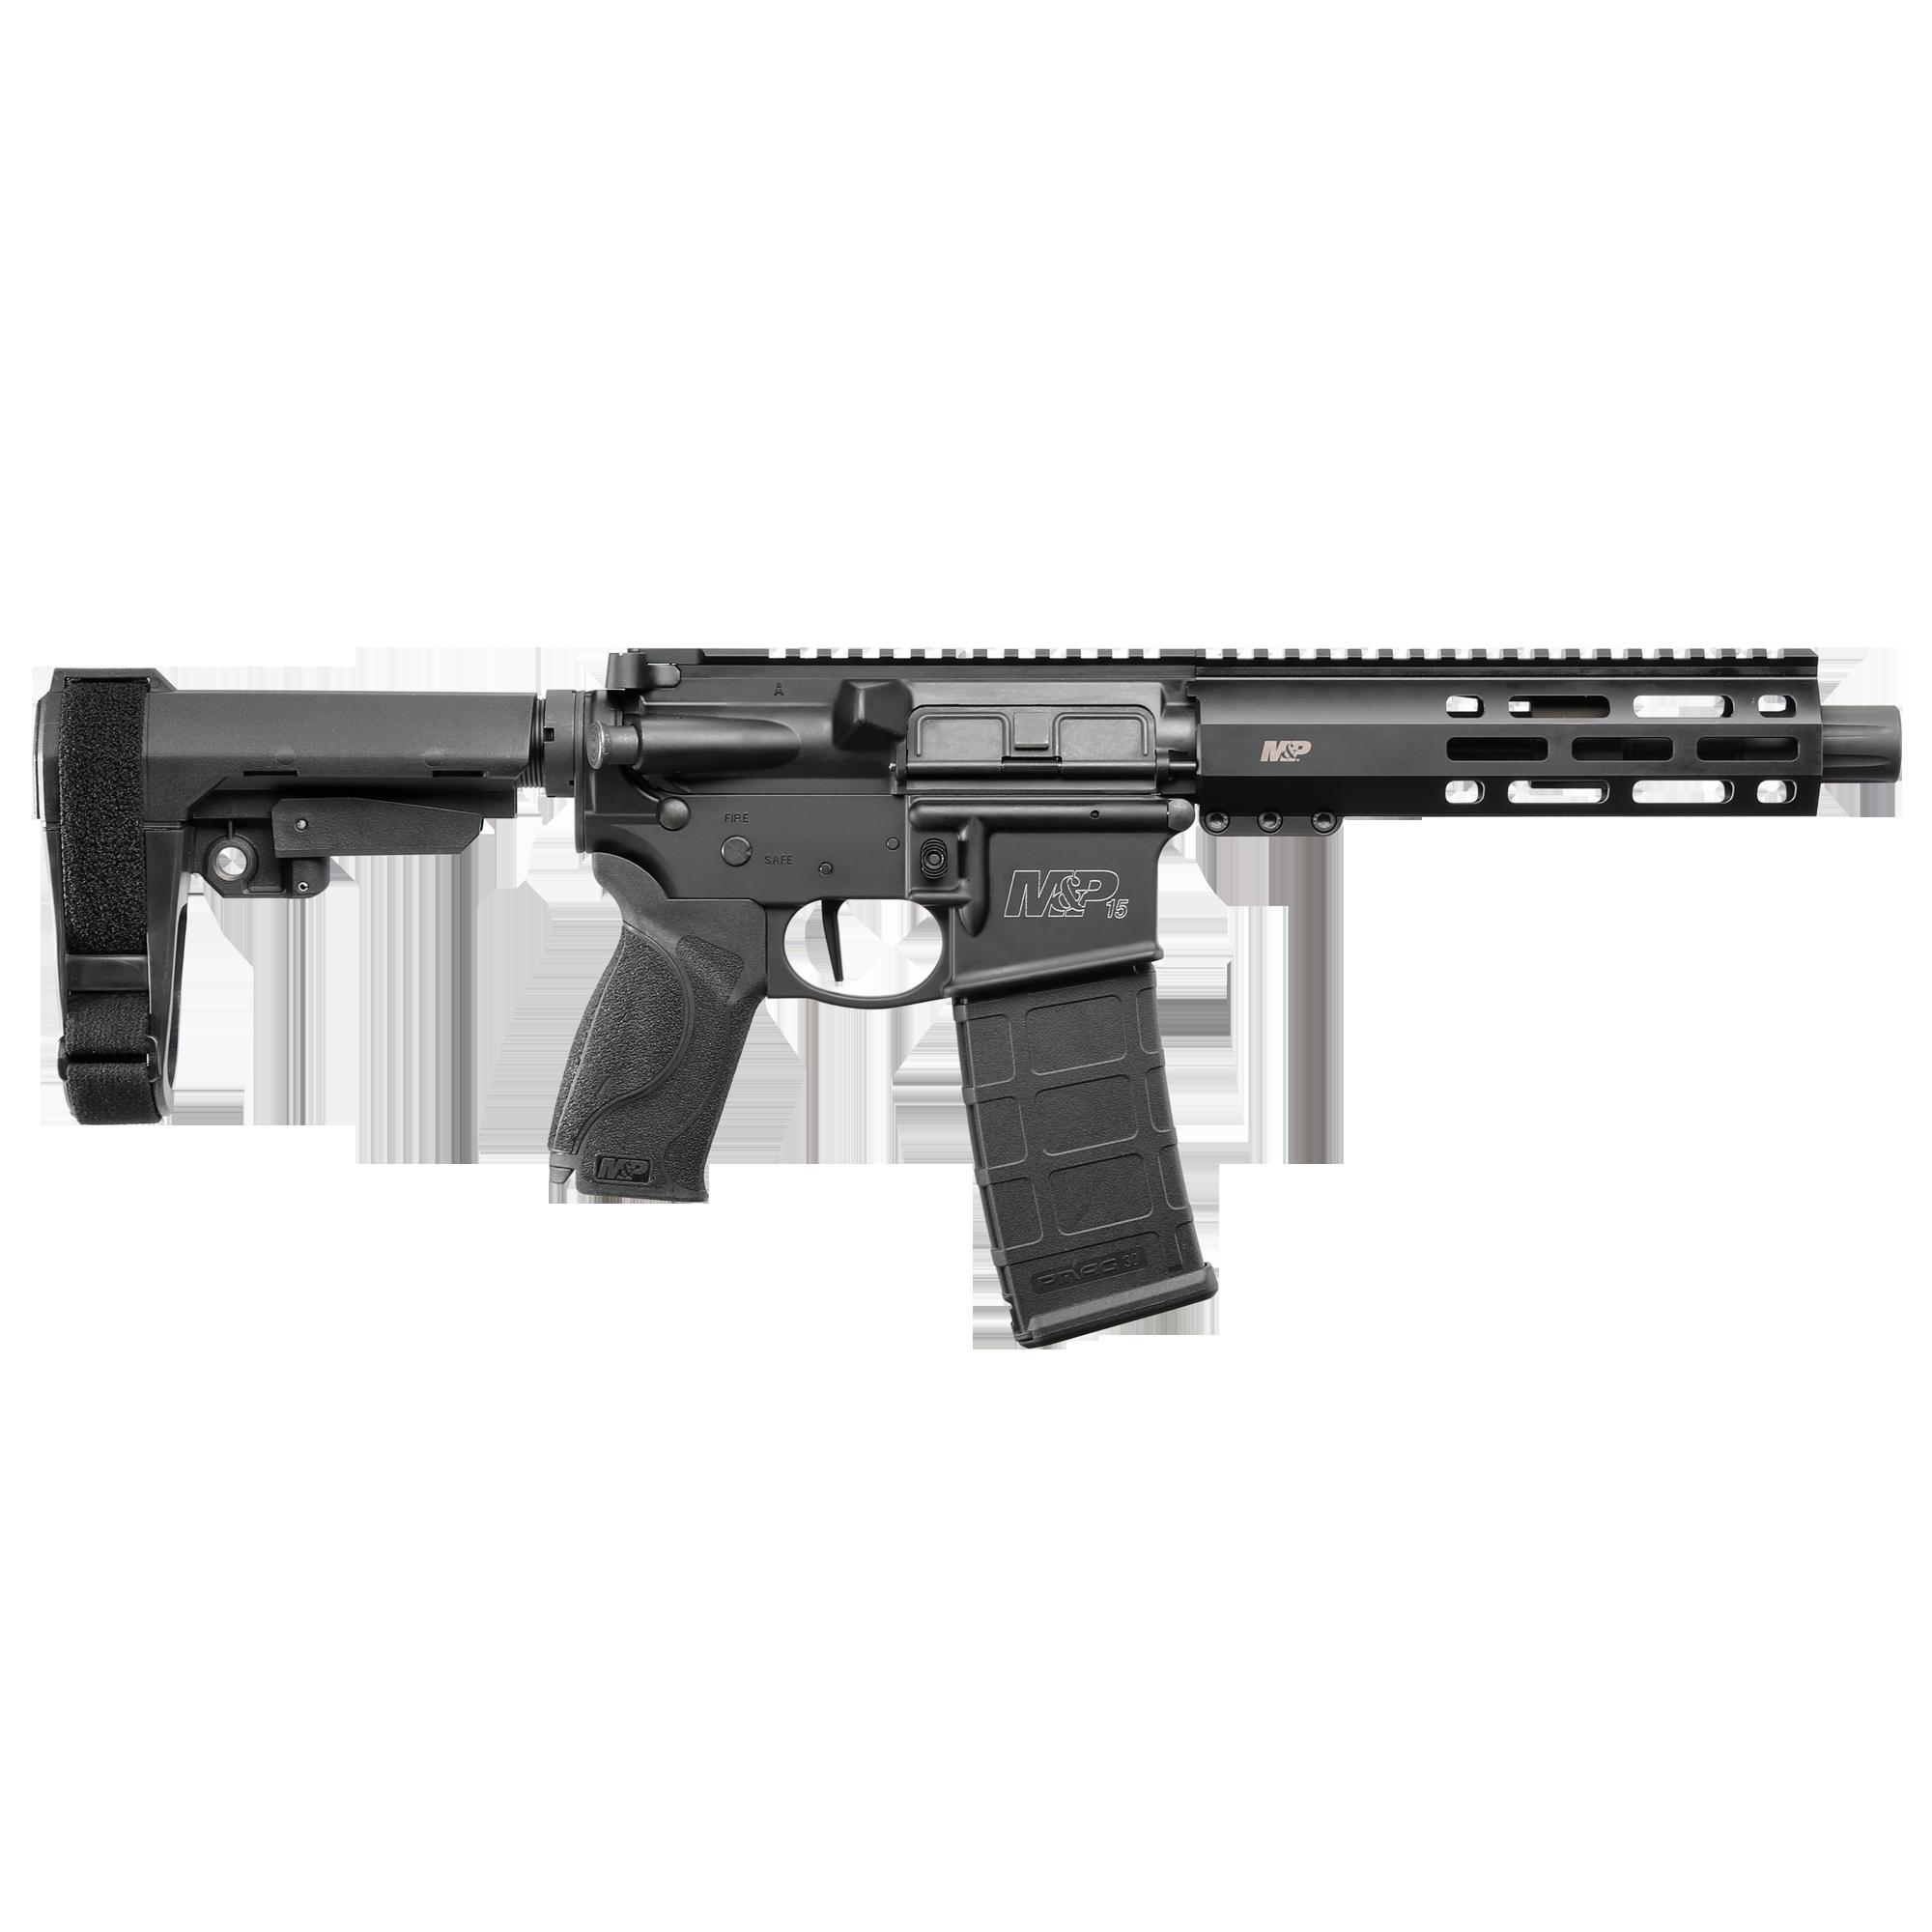 Smith & Wesson M&P15 Pistol 13320 7.5″ 30 Round 5.56